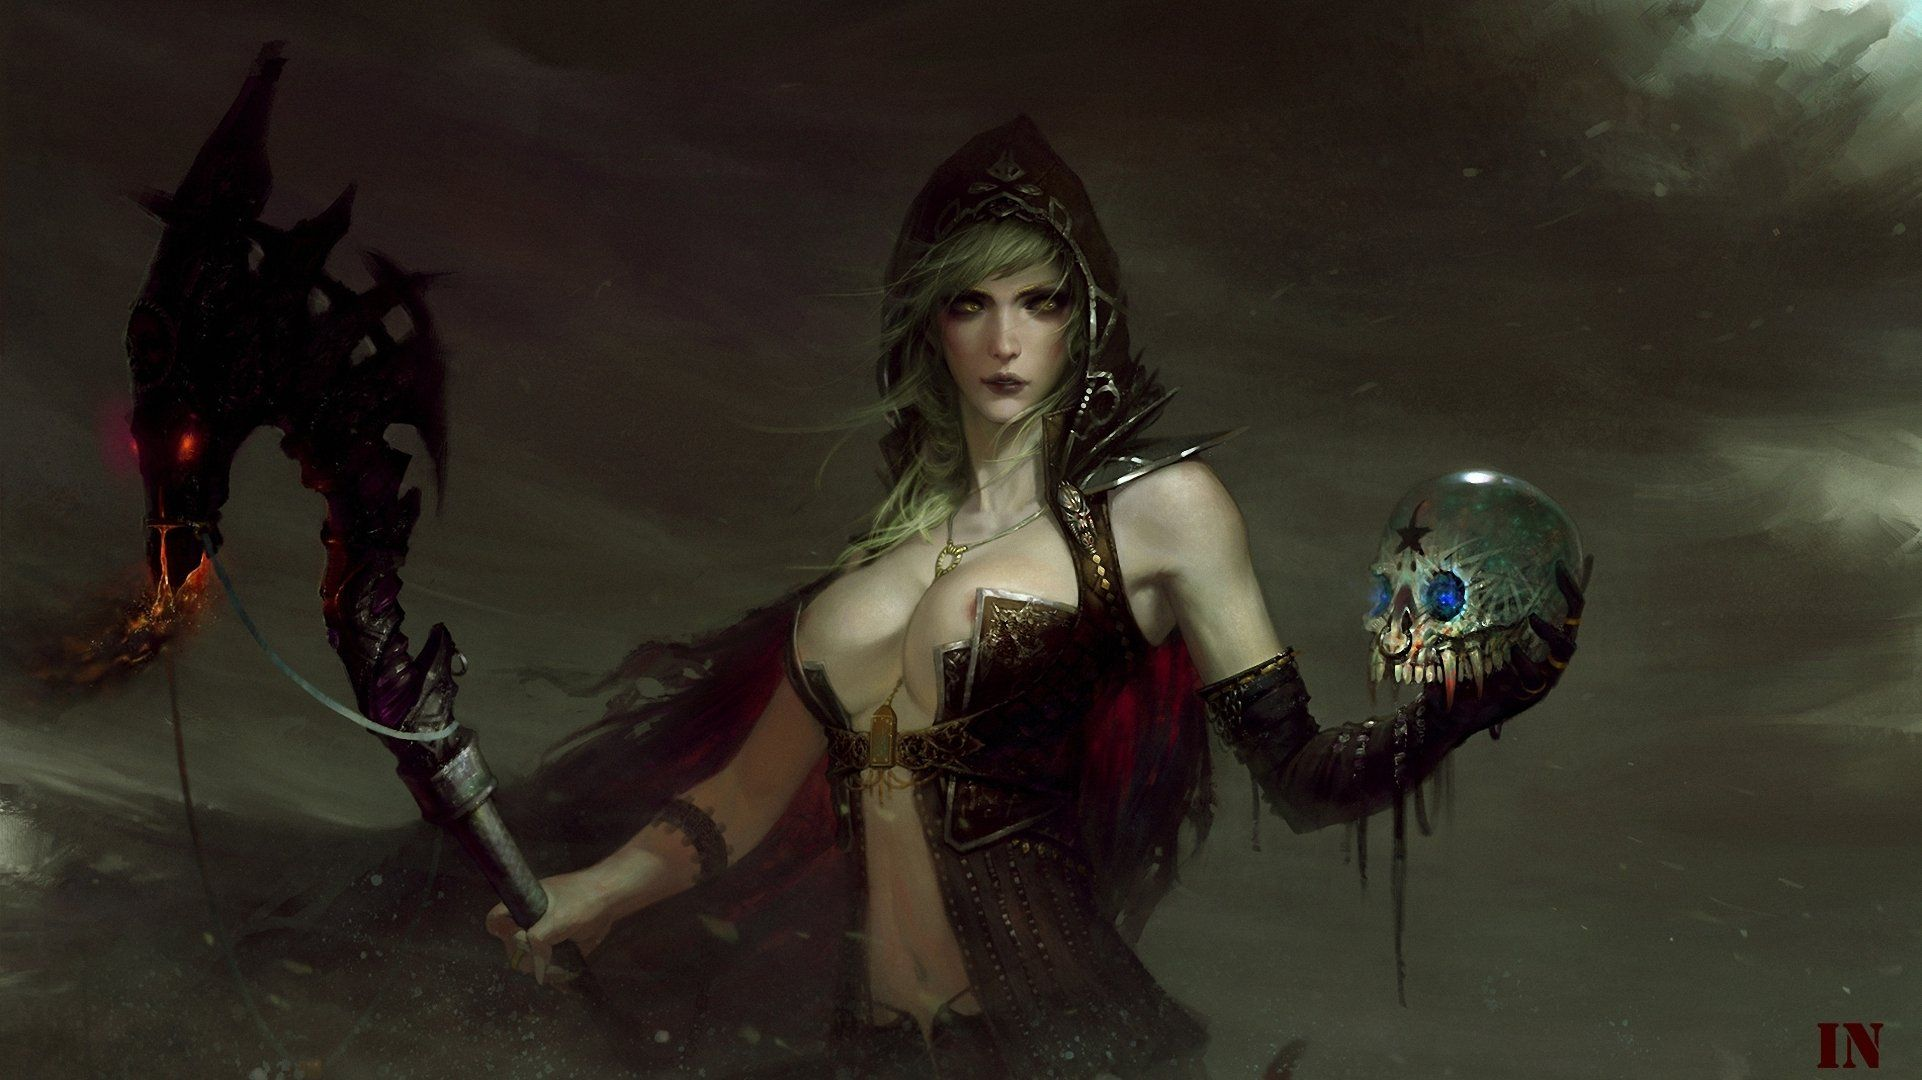 Magic Skull Gothic Mage Staff Hood Headgear Fantasy Girls